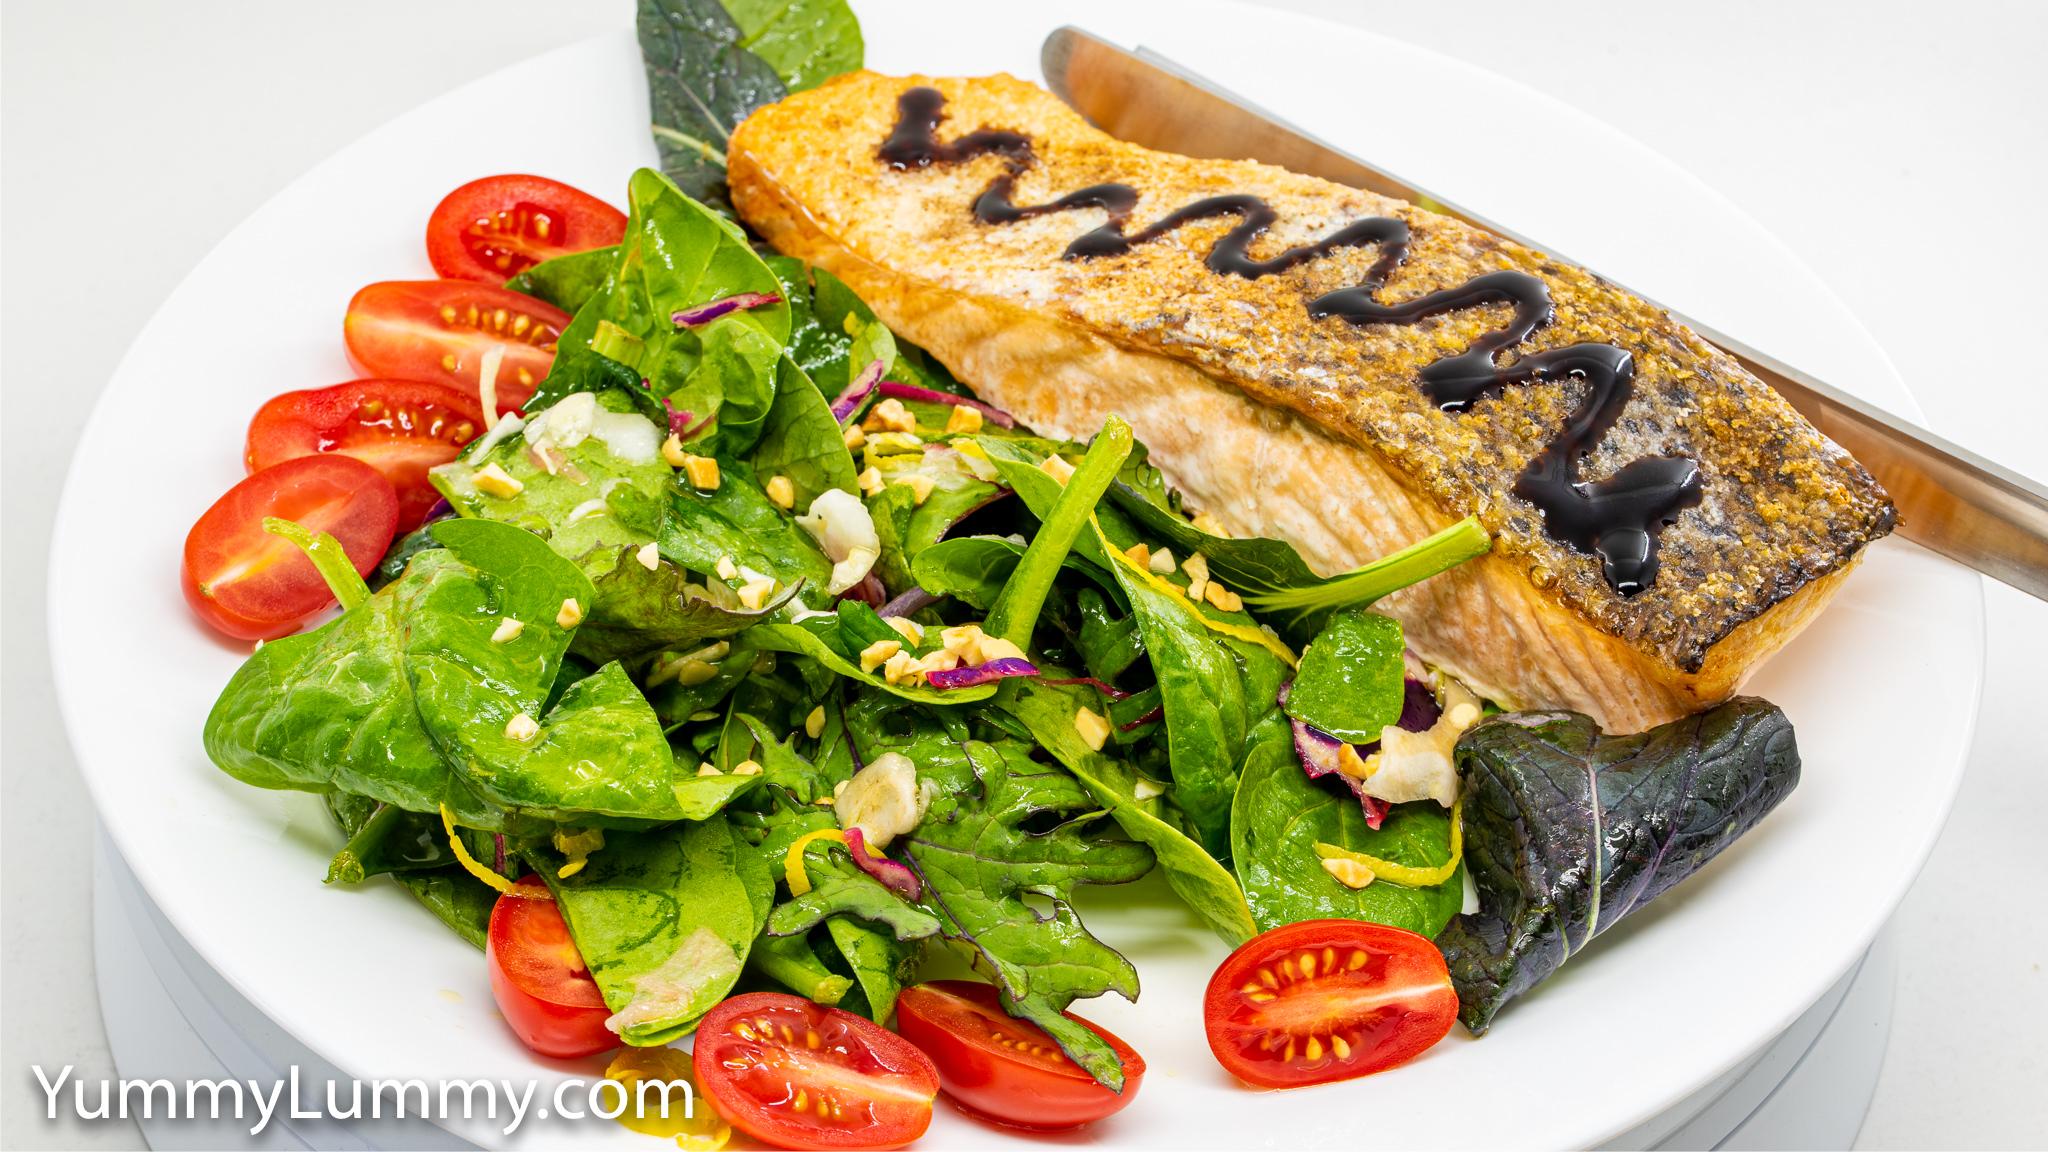 Photograph of Baked salmon and salad. Gary Lum.